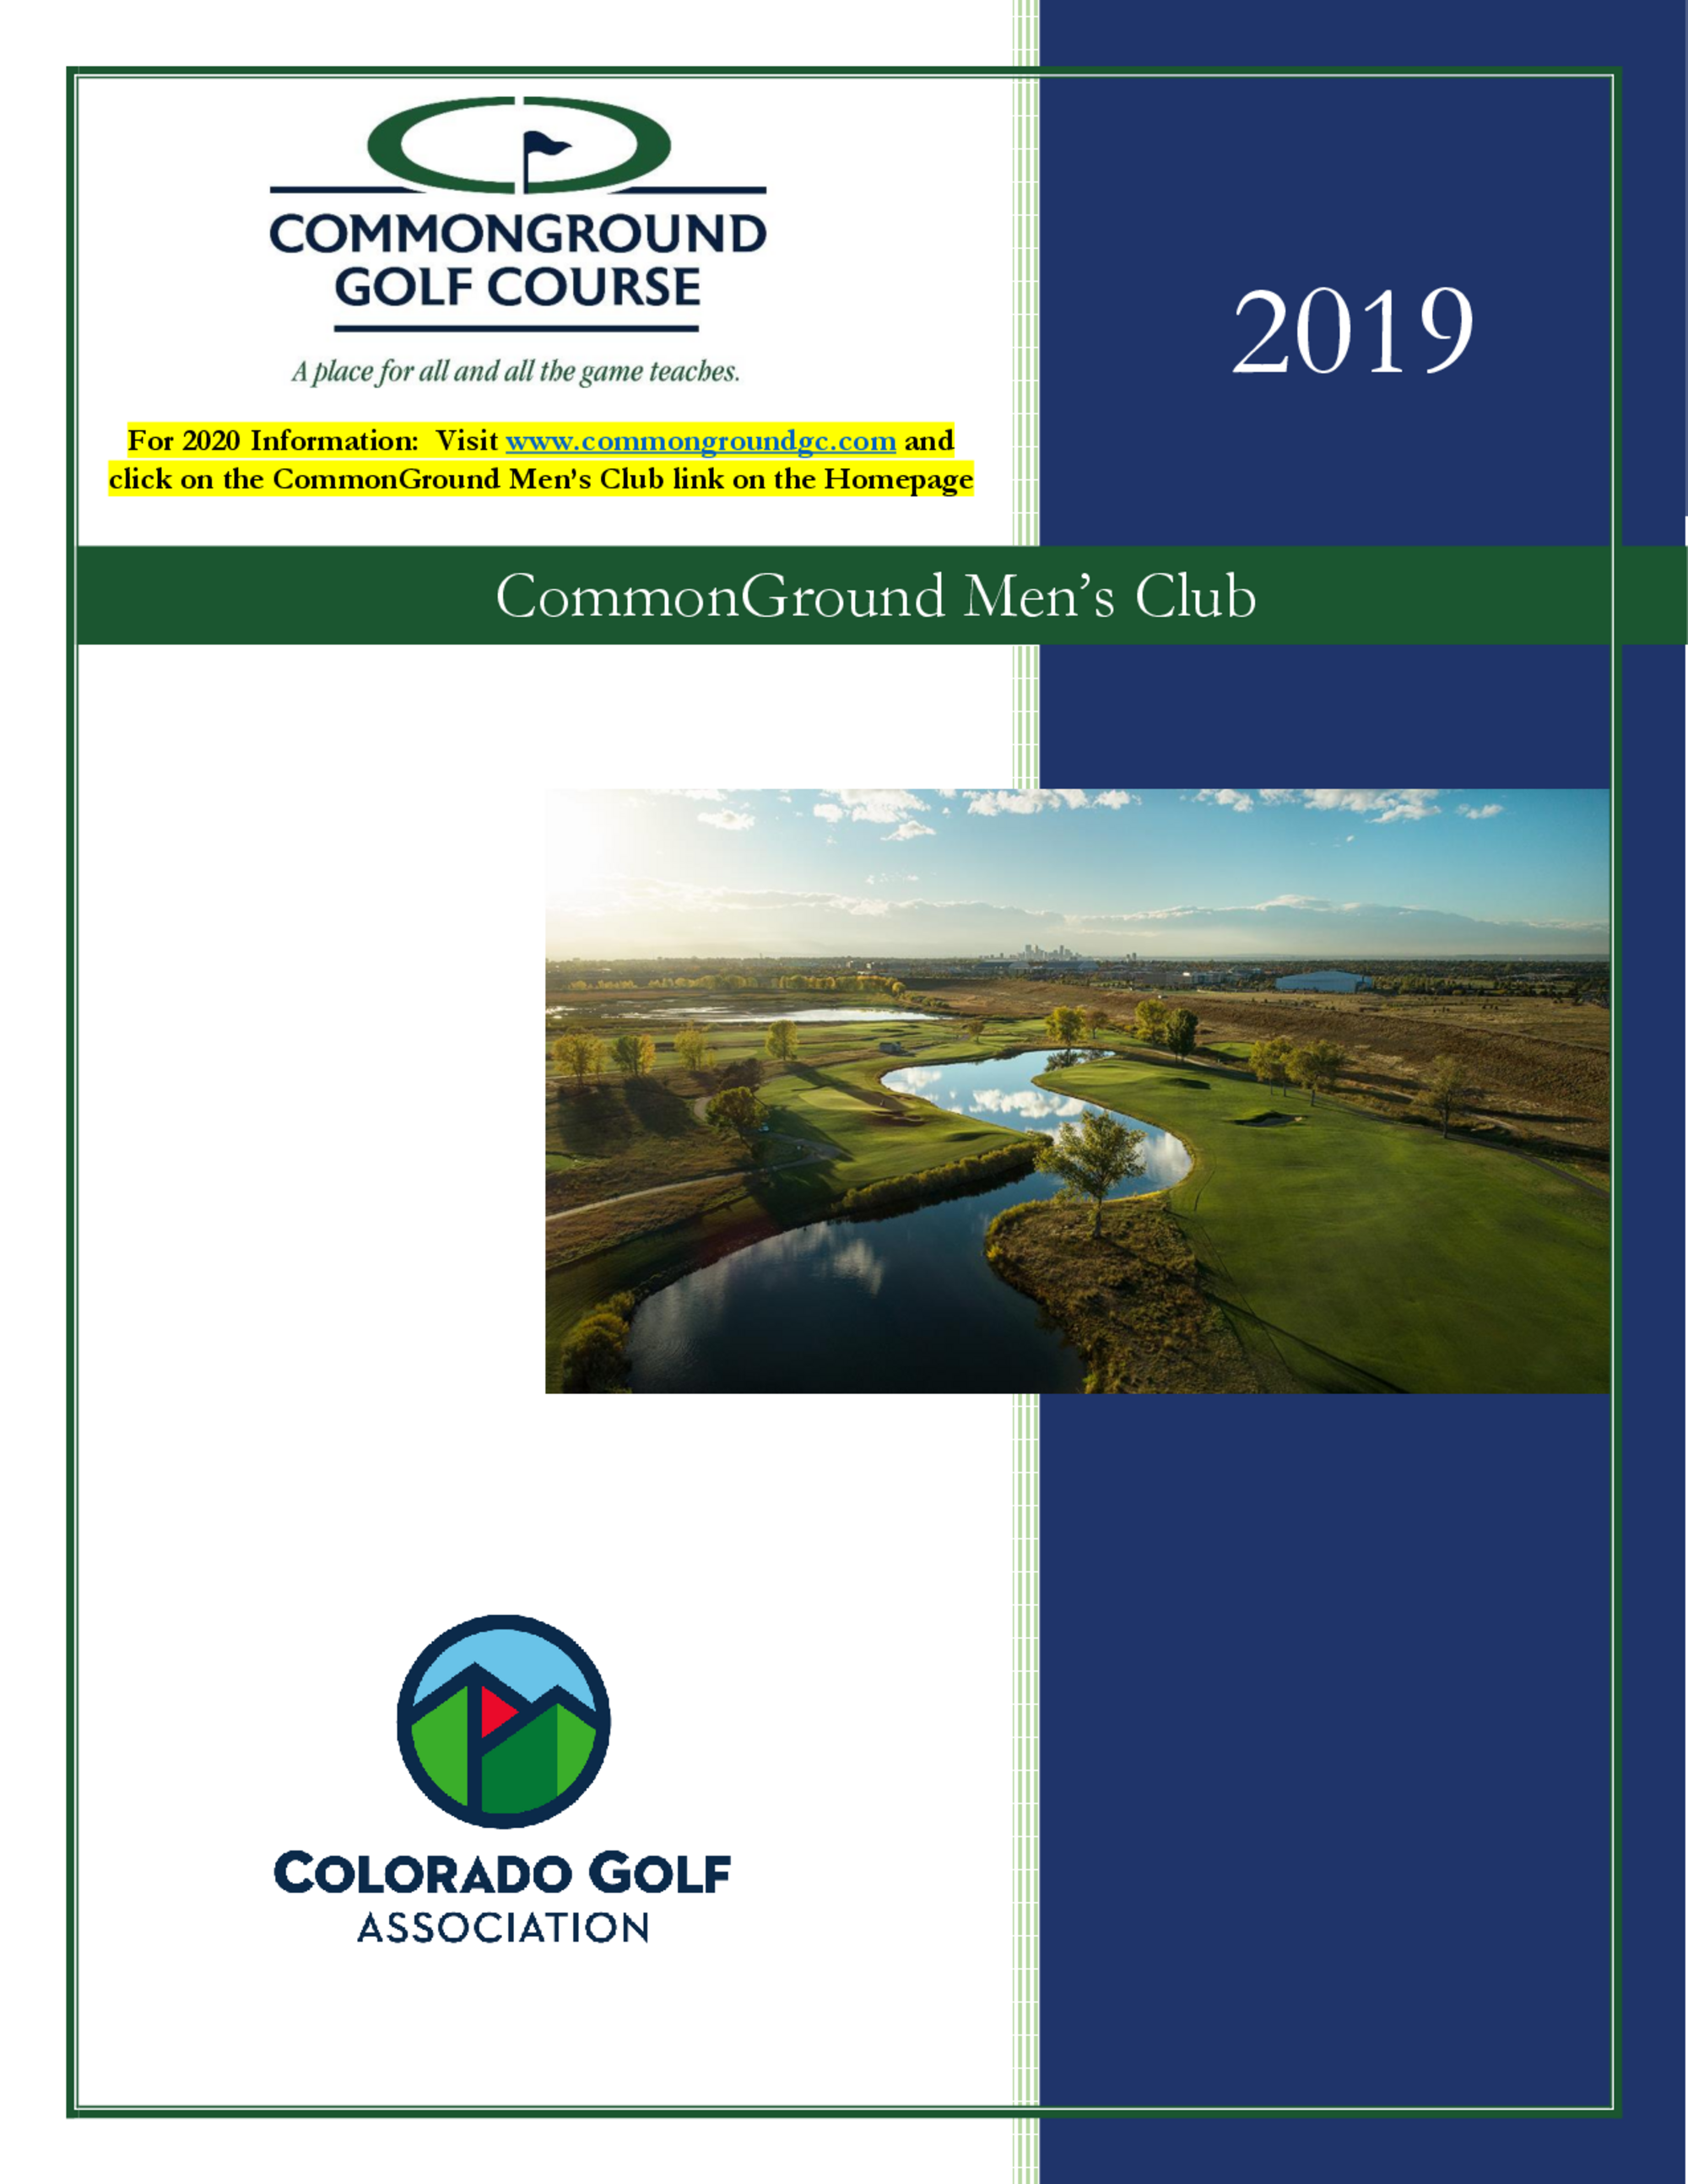 Tournament portal cover sheet 1